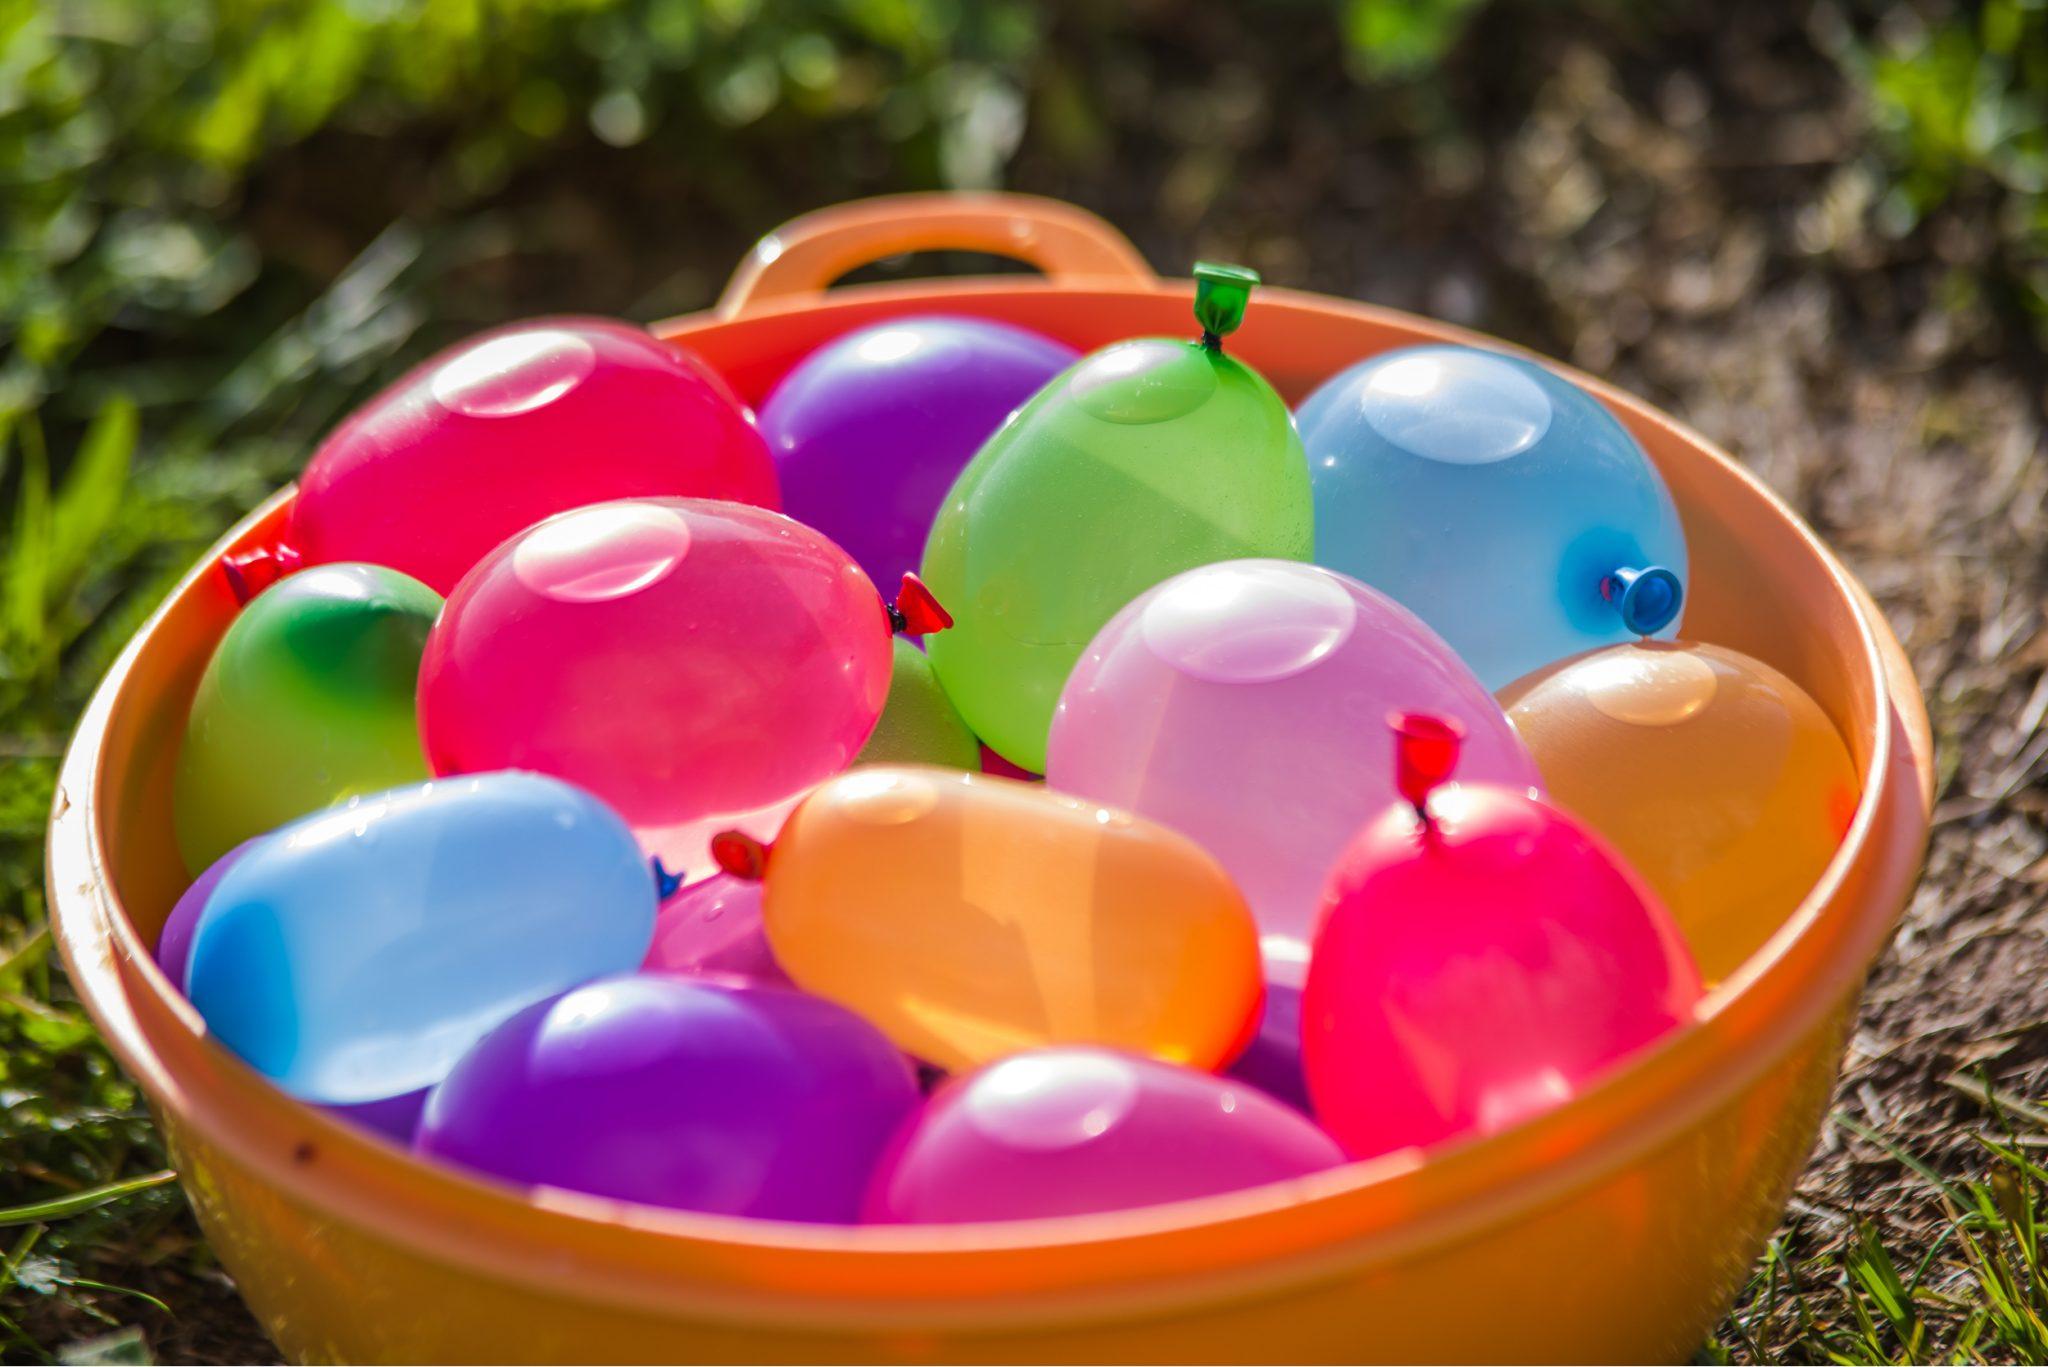 Fun Yard Games for Kids Water Balloon Toss